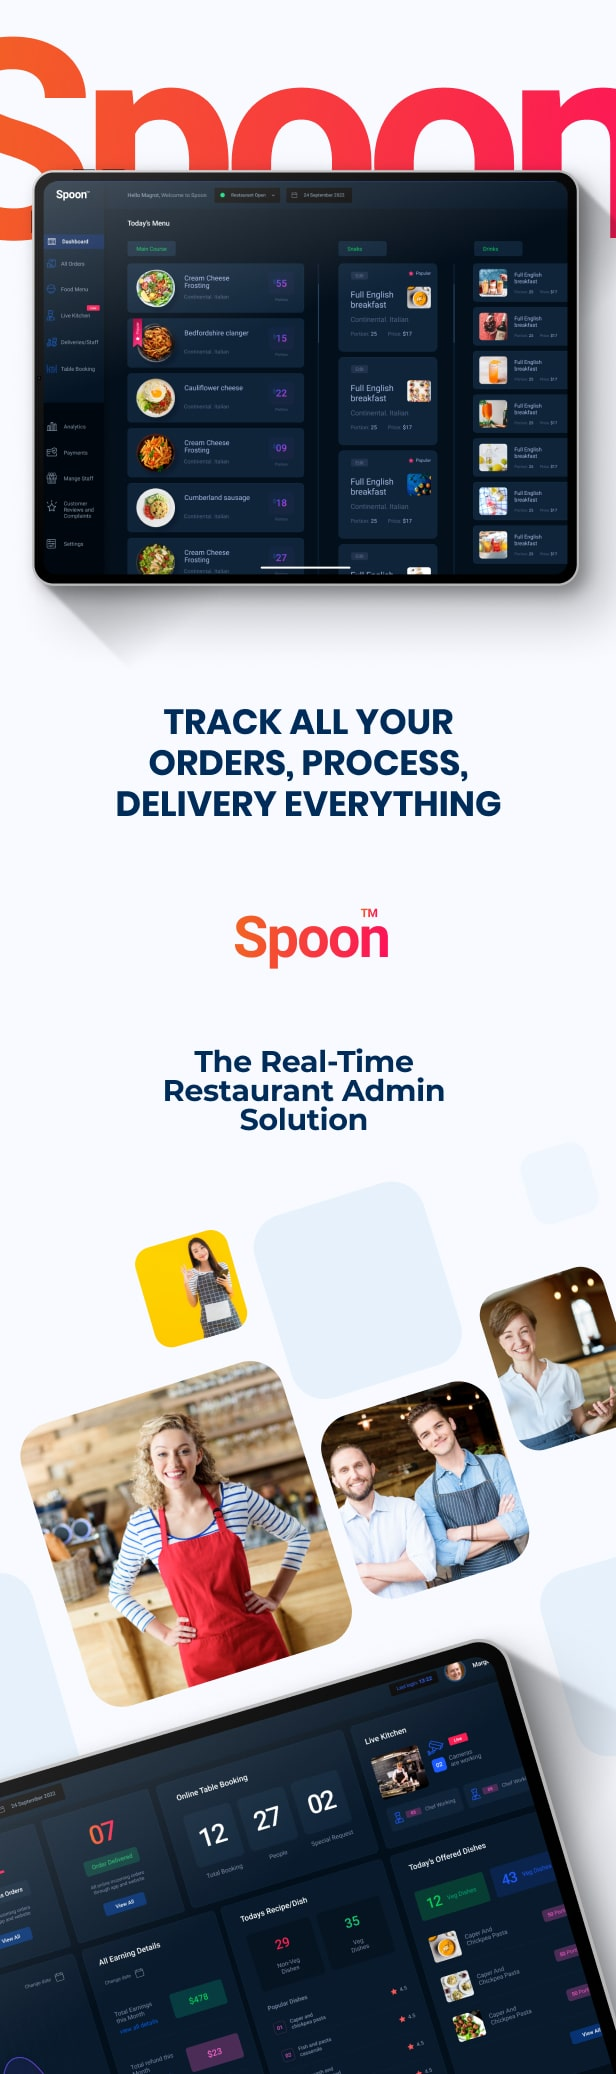 Spoon | Restaurant SaaS Dashboard Figma Design Templates - 1